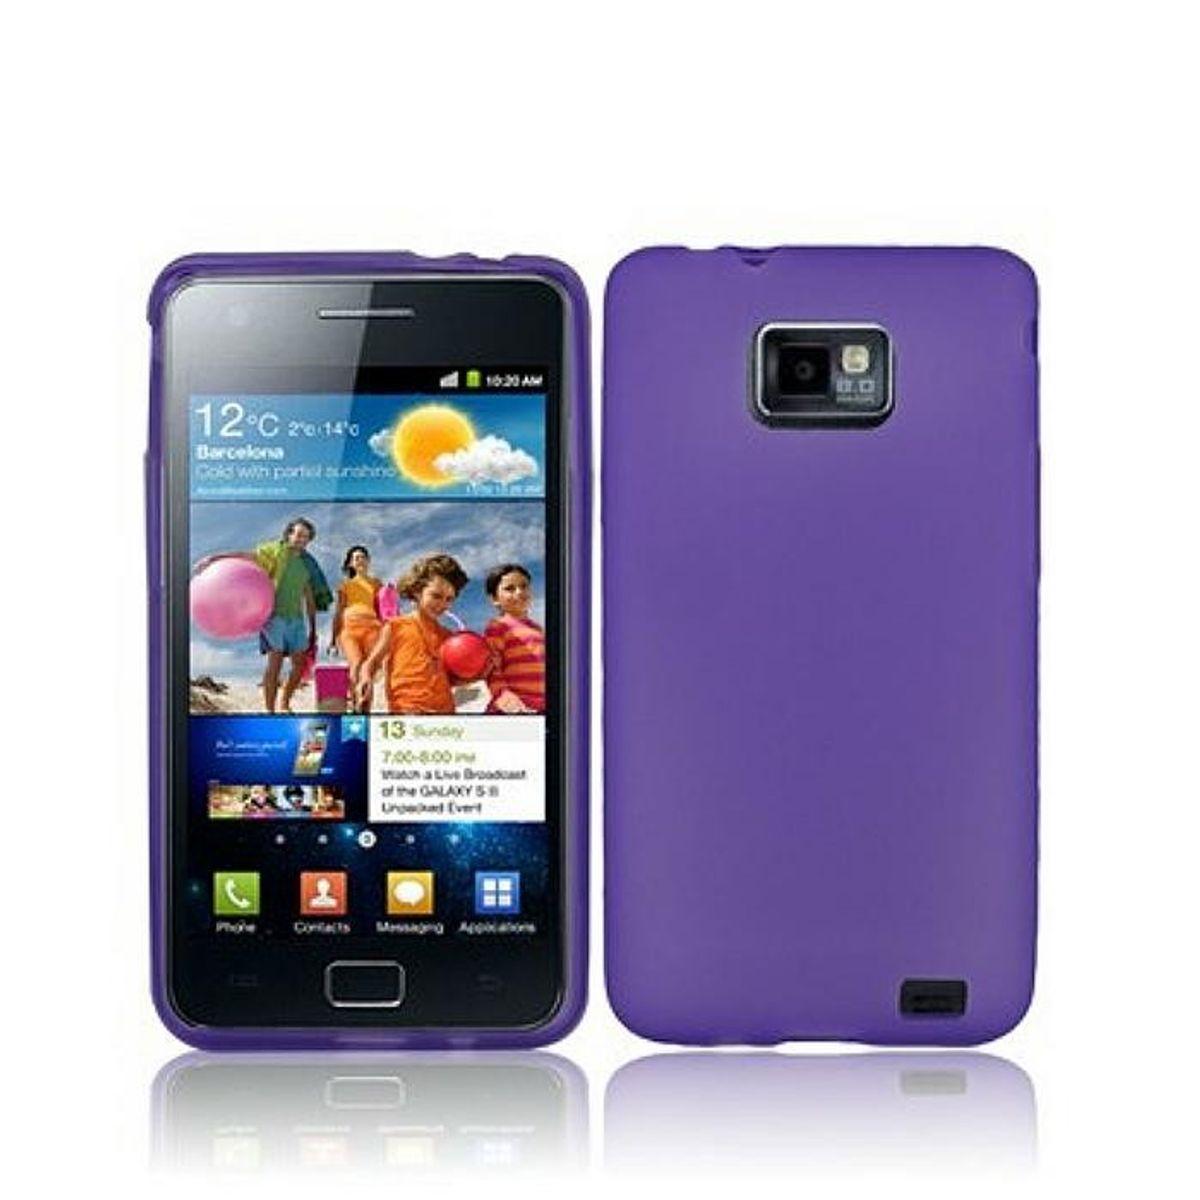 Schutzhülle TPU Case für Handy Samsung I9100 Galaxy S2 Lila